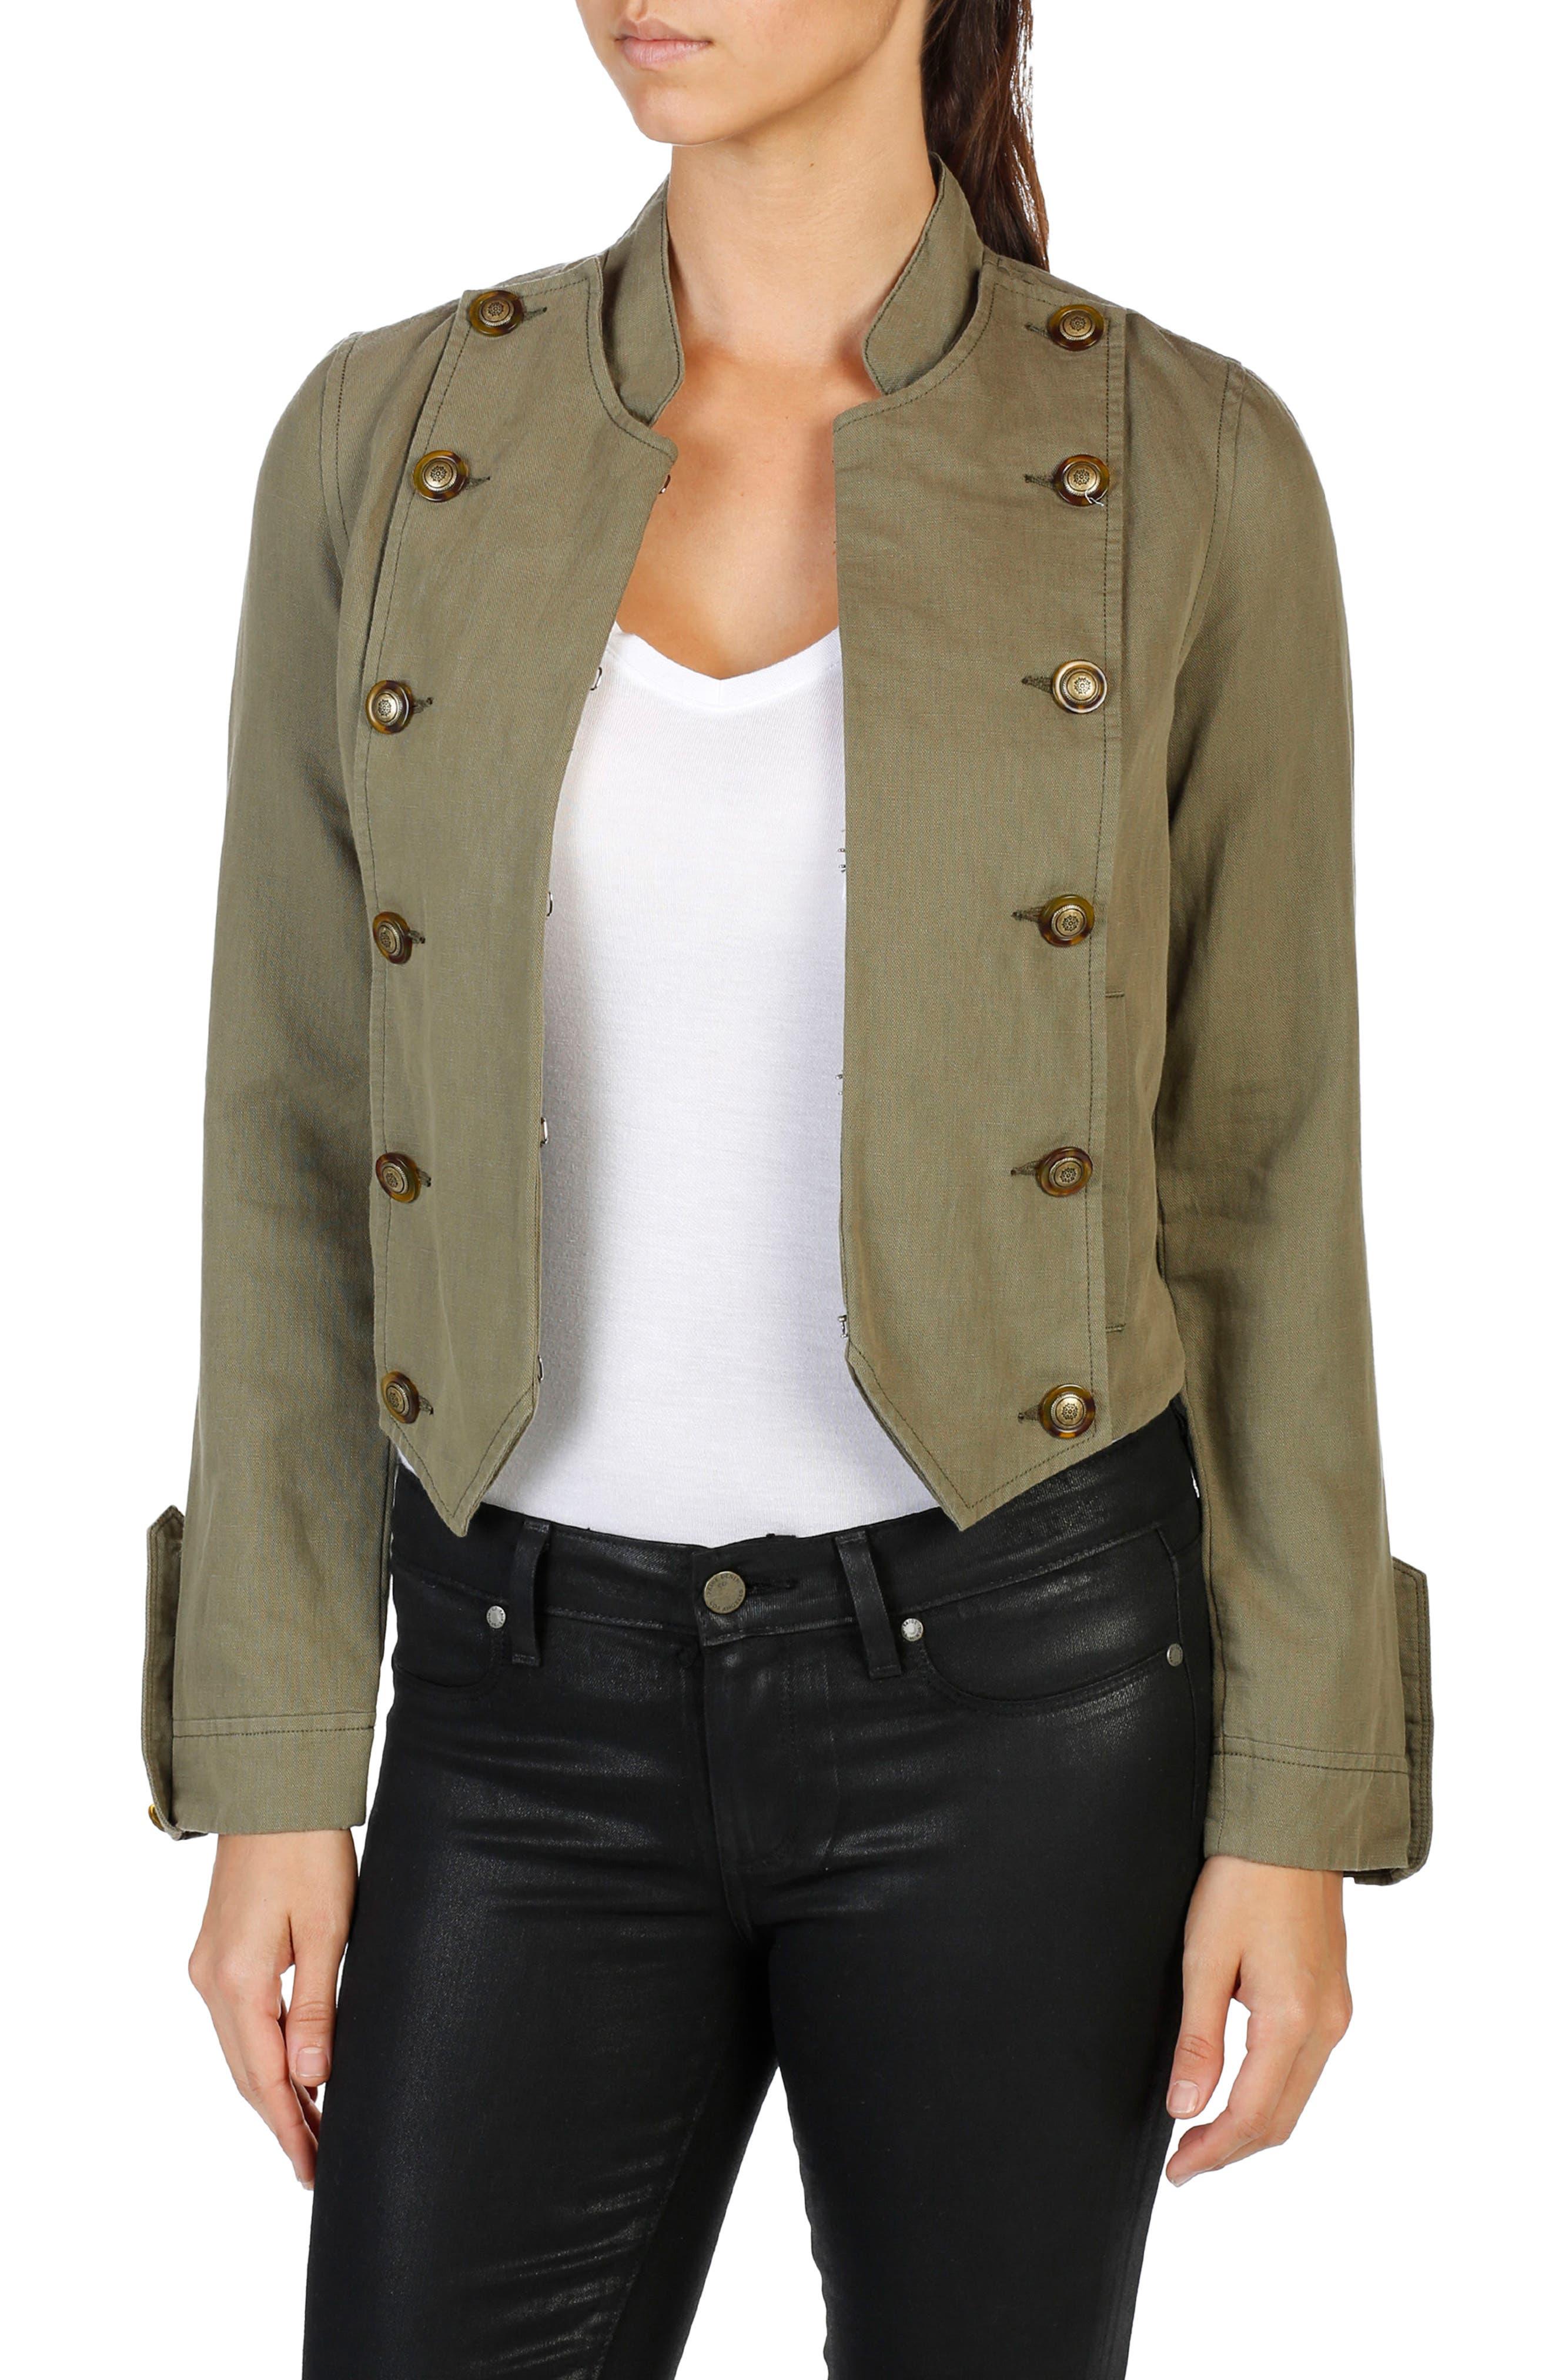 Ashley Military Jacket,                             Main thumbnail 1, color,                             309